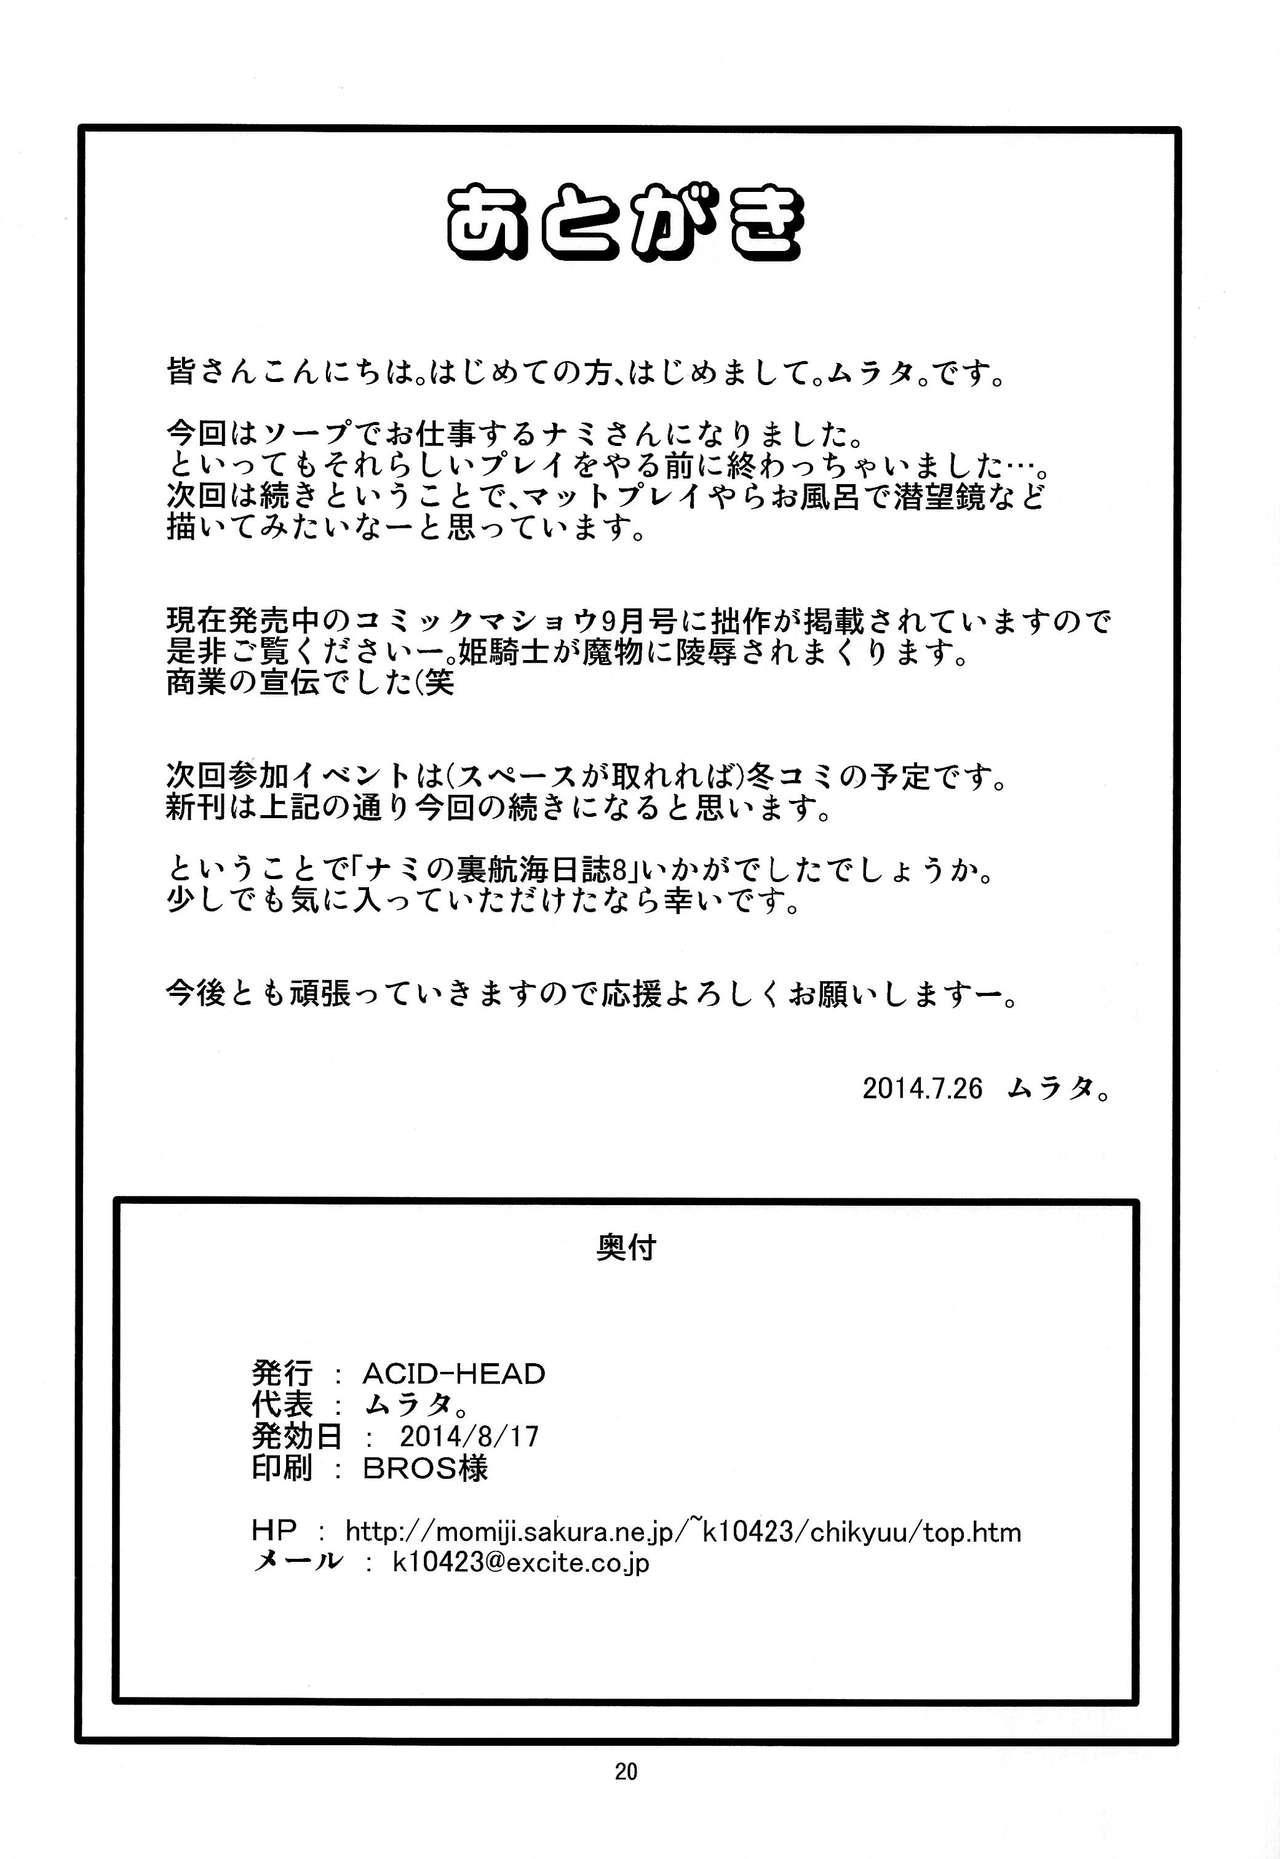 Nami no Ura Koukai Nisshi 8   Nami's Hidden Sailing Diary 8 20